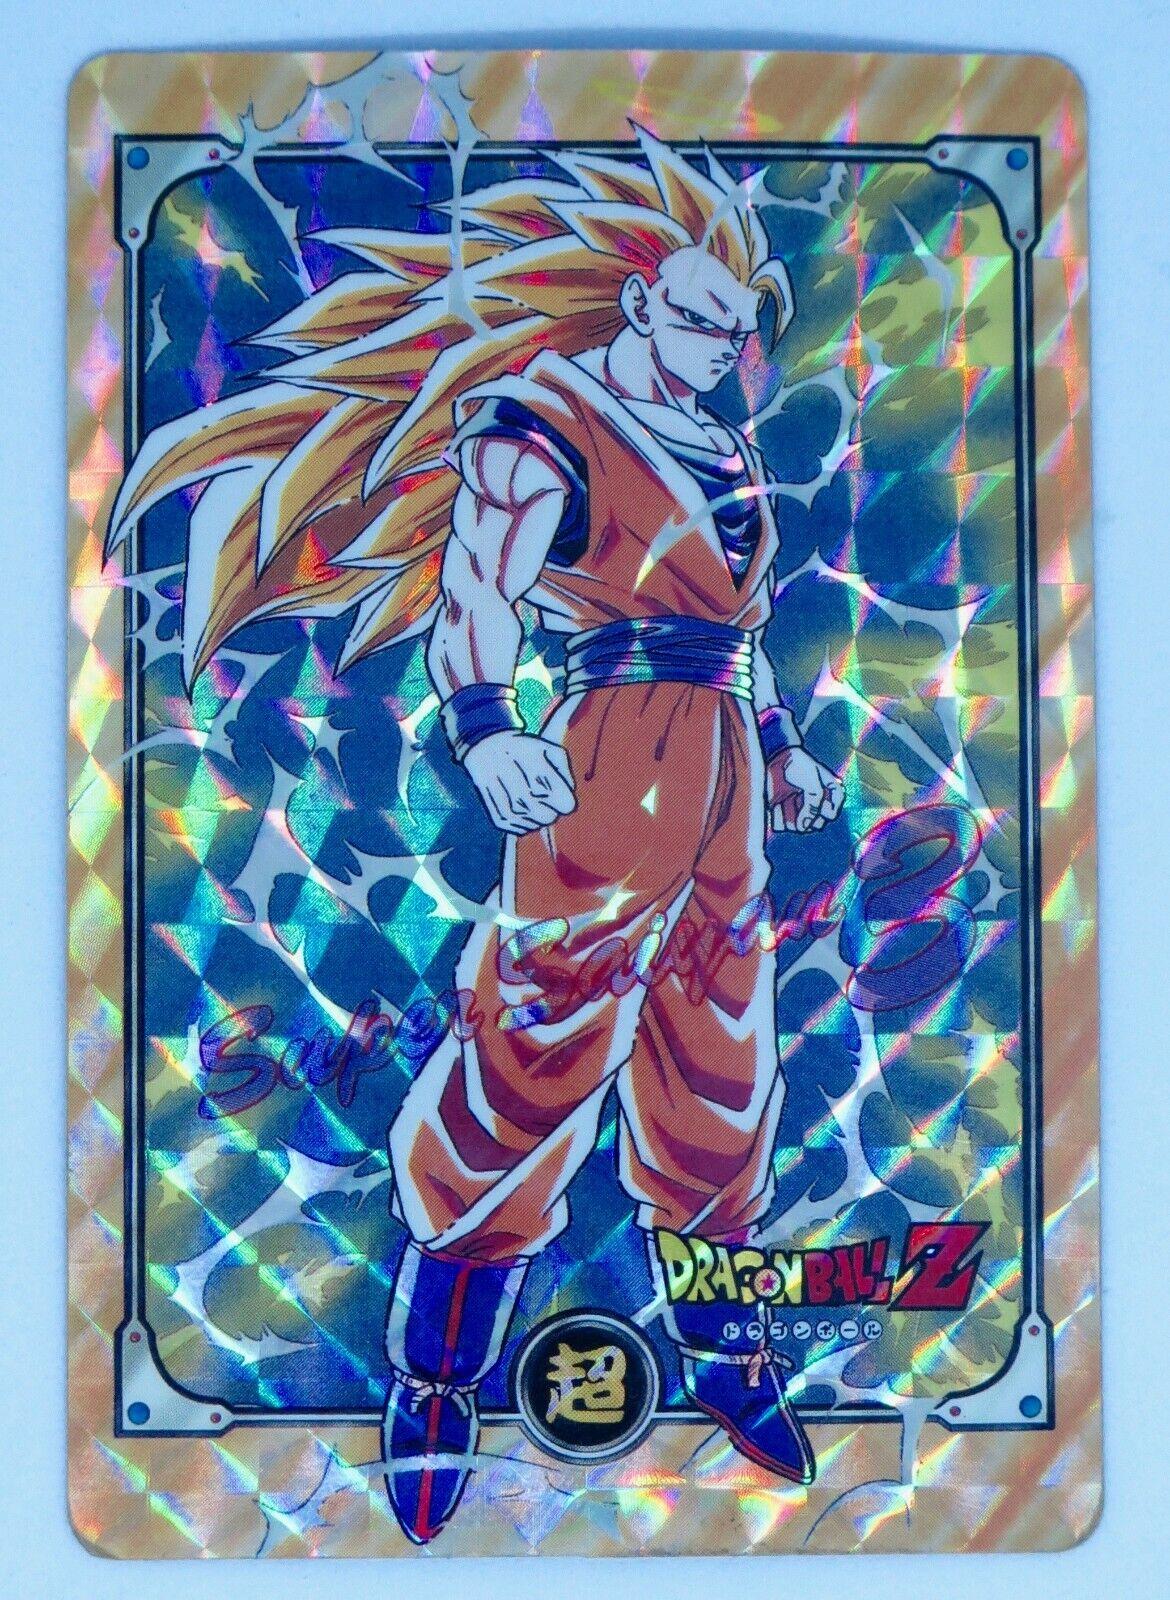 Dragon Ball Z Carddass Part.16 HORS SERIE SERIE SERIE N hs Carte Secrete1995 Bandai France 795e46